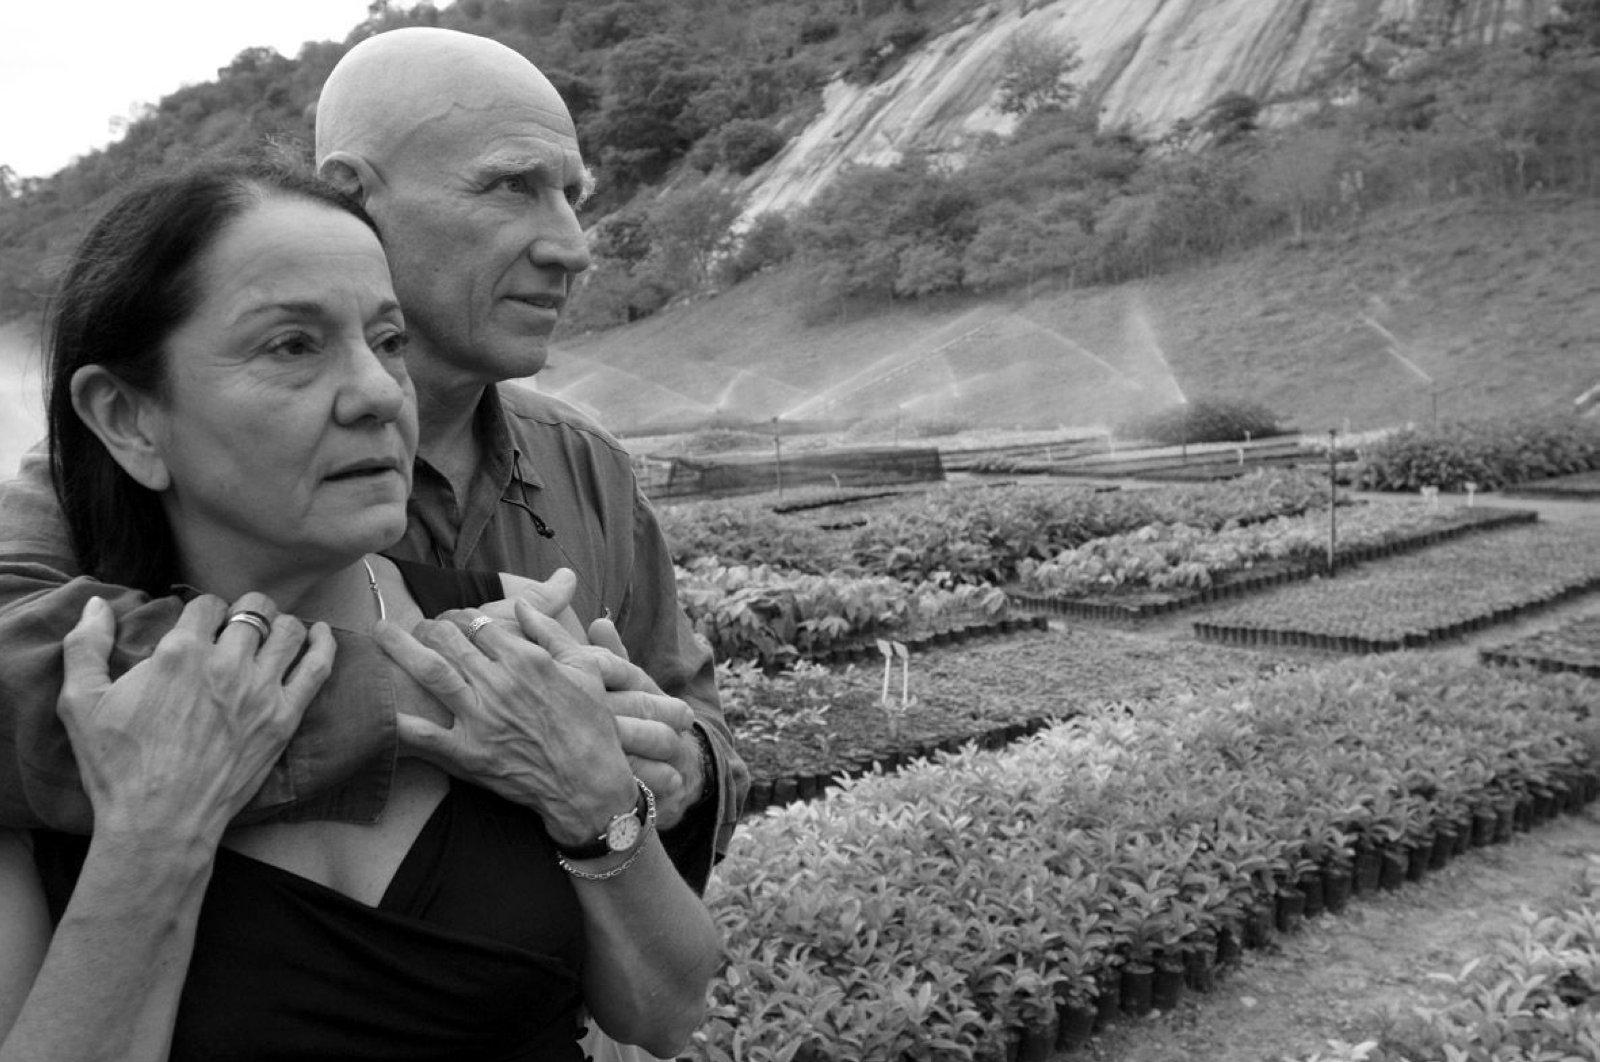 Sebastiao Salgado and his wife Leila at Instituto Terra. (Photo courtesy of StandbyForMindControl.com)